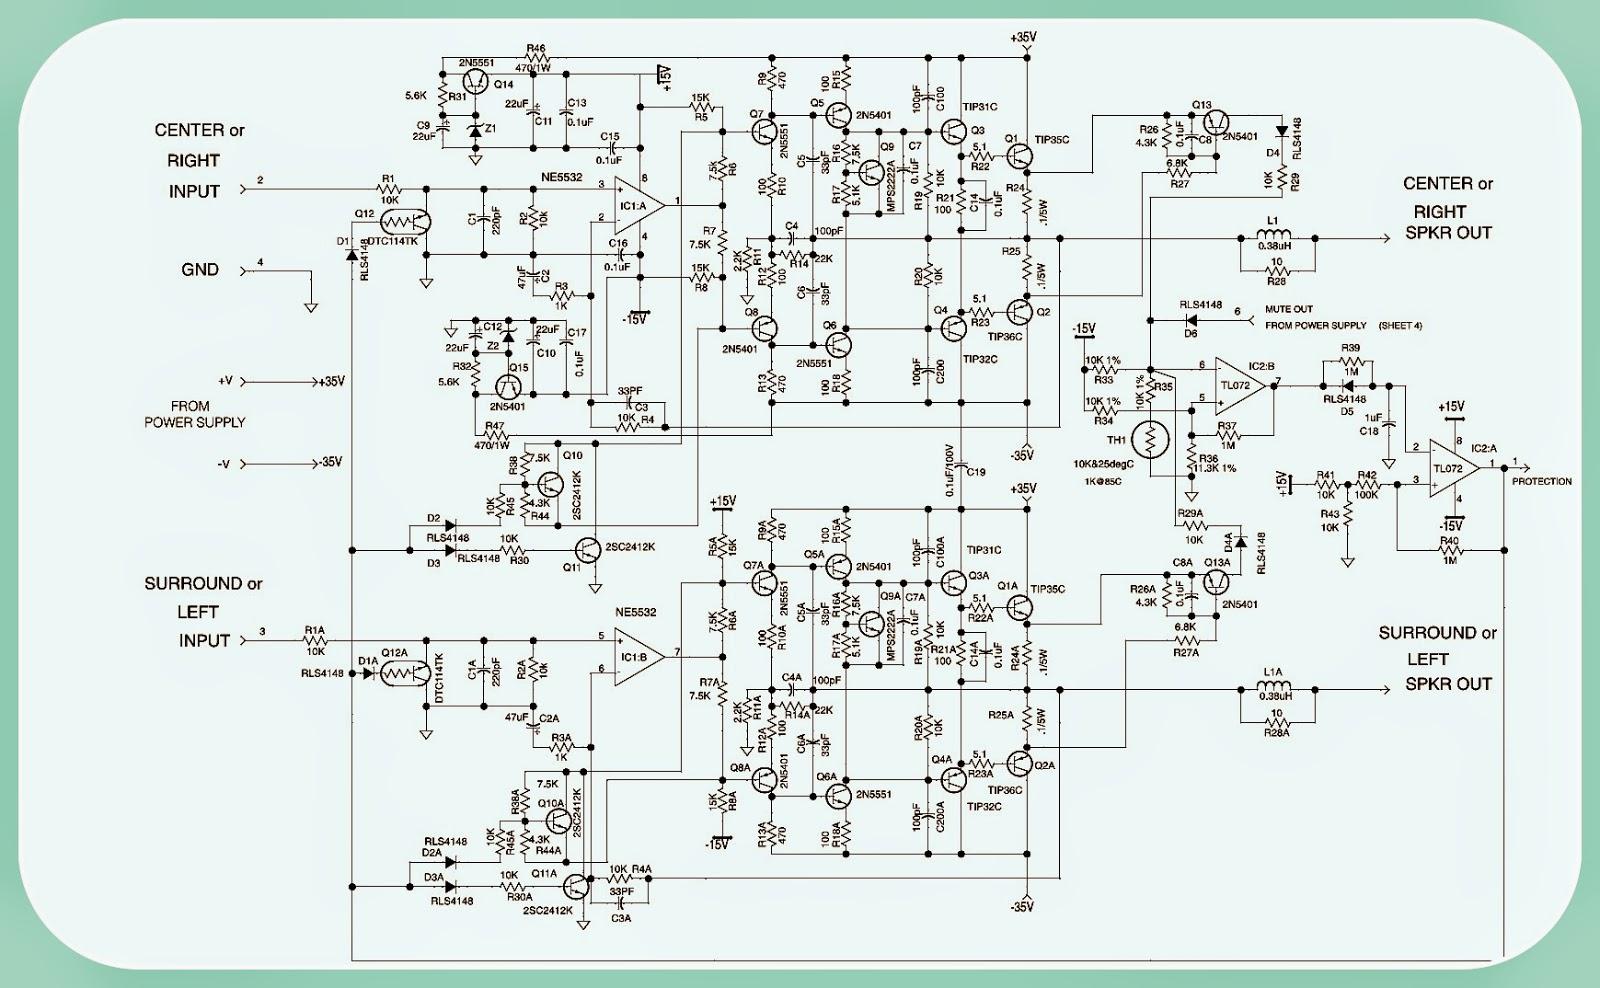 BASS 550 JBL Powered Subwoofer SCHEMATIC Circuit Diagram